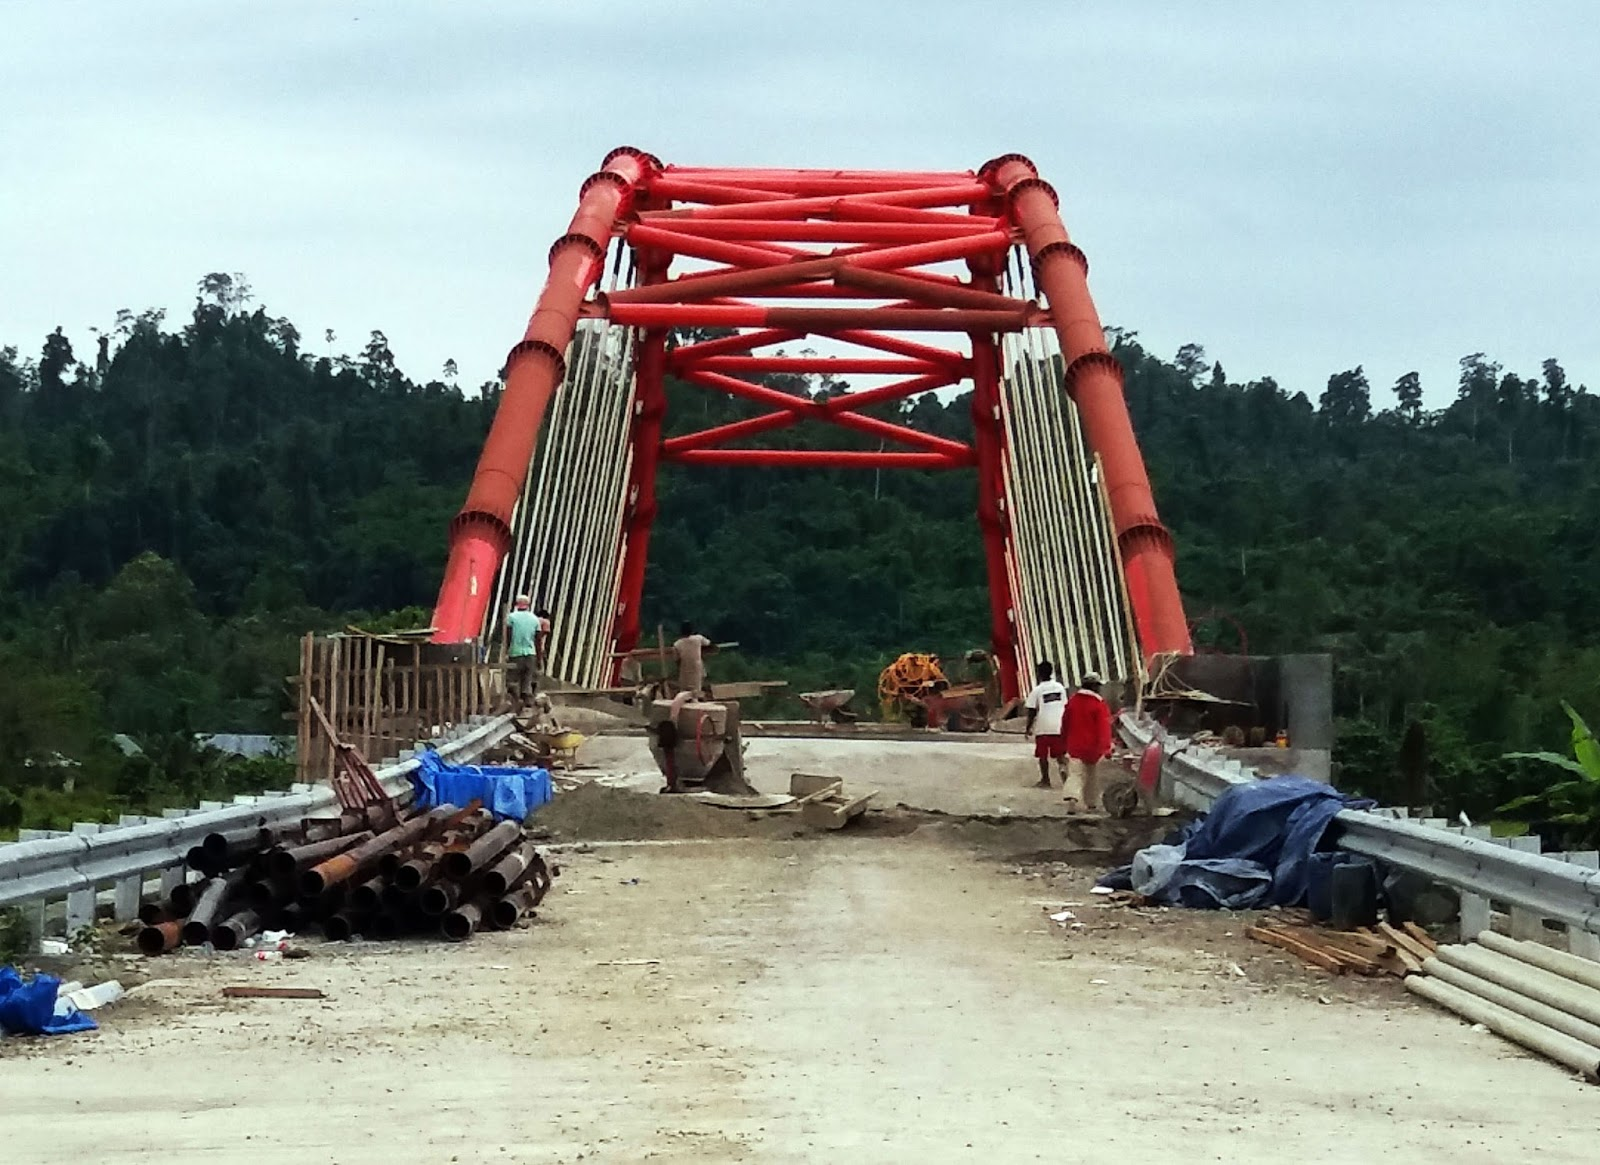 Jembatan Merah Salunggabo Obyek Berselfi Kota Pasangkayu Hampir Rampung Palu